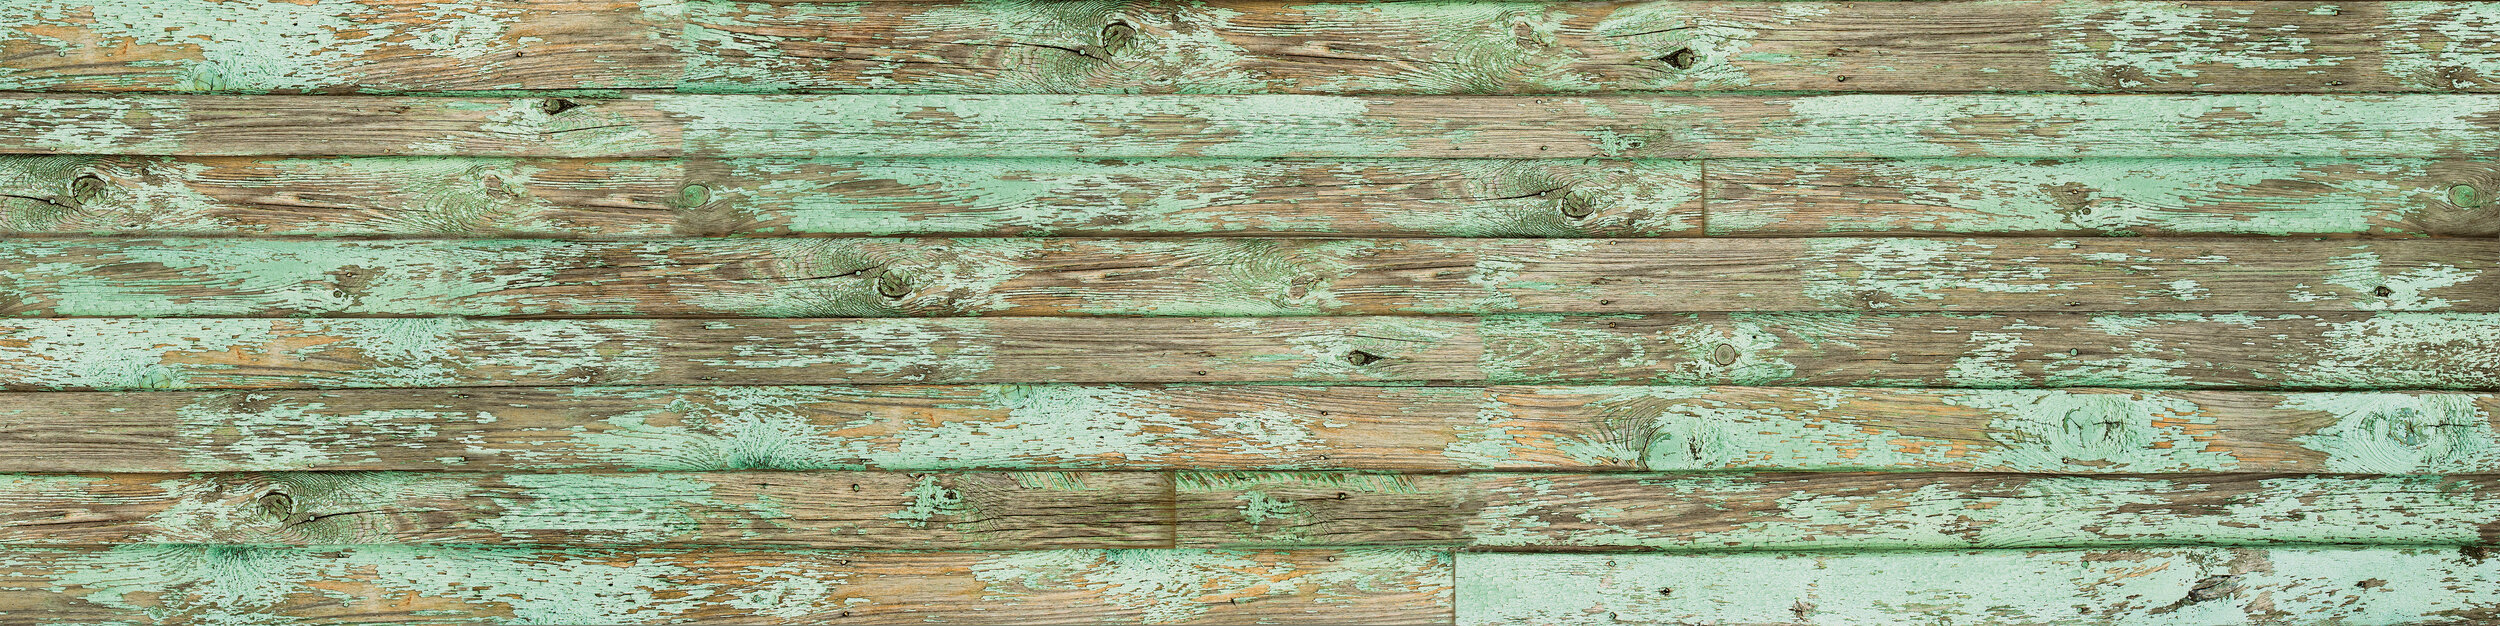 STX Old Paint Green 9 16 19-website.jpg